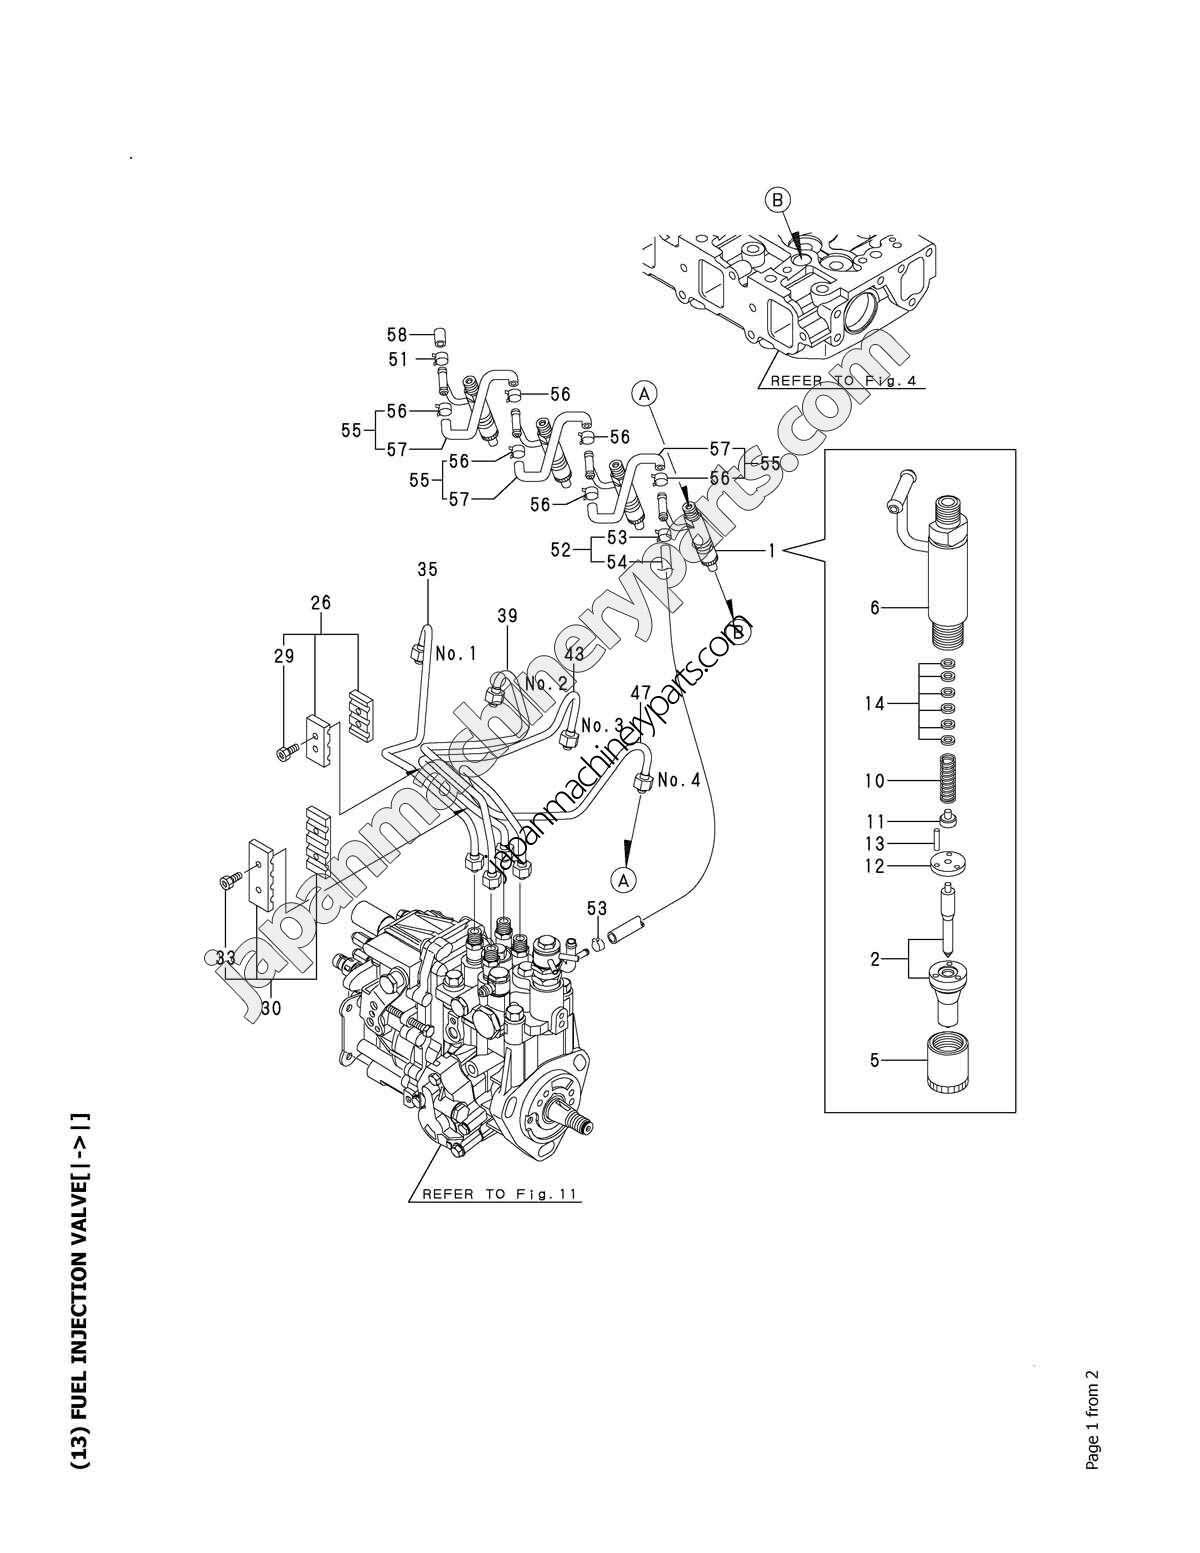 4tnv88 Yanmar Engine Wiring Diagram - Electrical wiring diagrams on